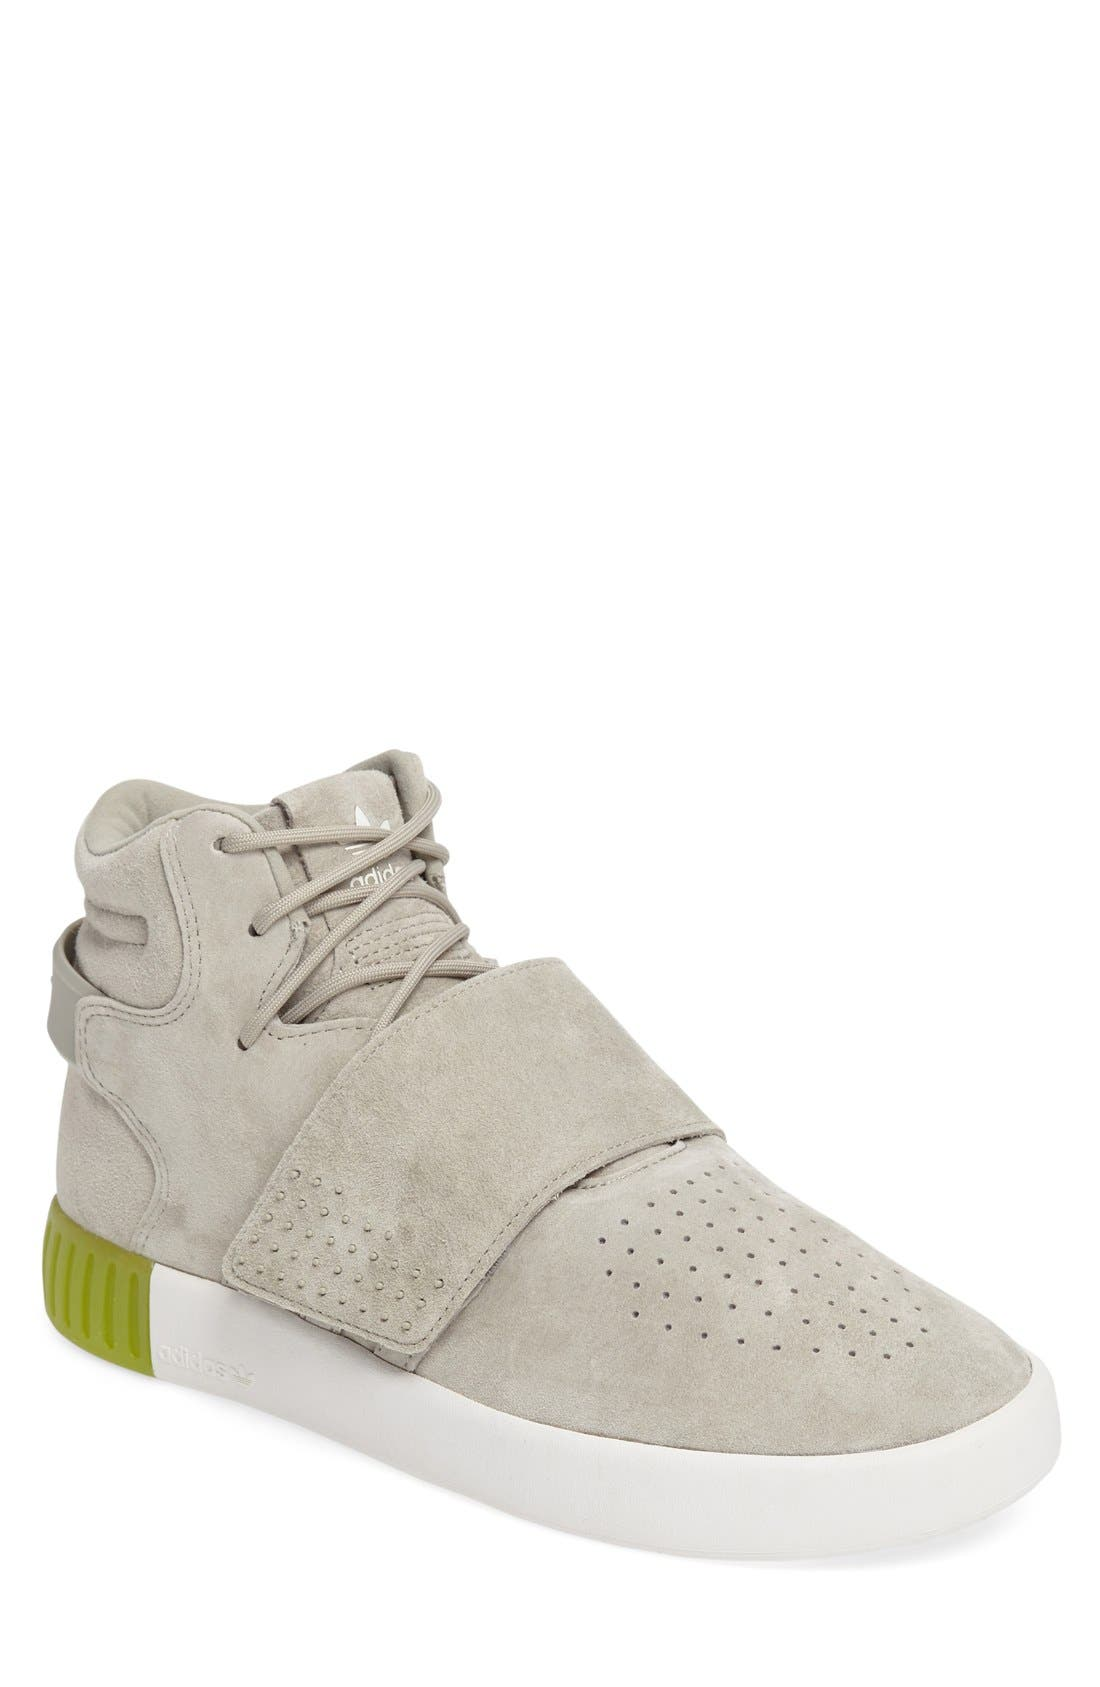 Main Image - adidas 'Tubular Invader' Sneaker (Men)